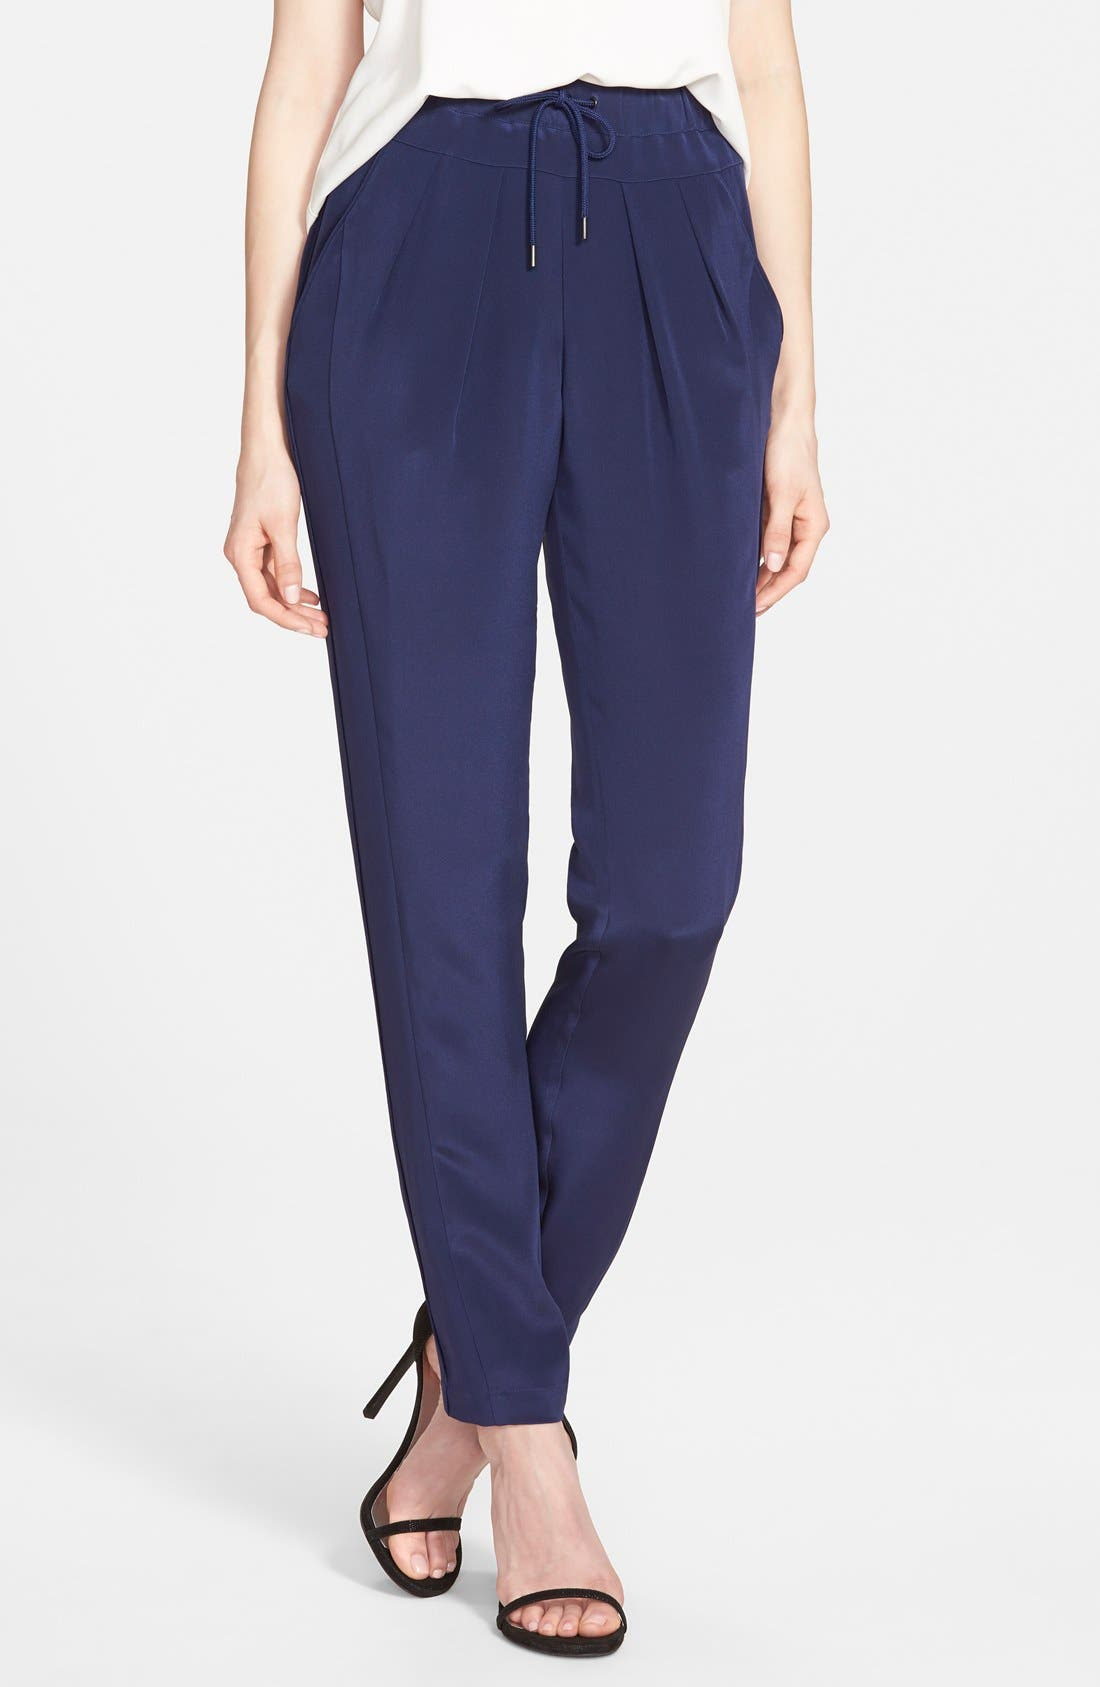 Alternate Image 1 Selected - Rebecca Minkoff 'Malone' Silk Drawstring Pants